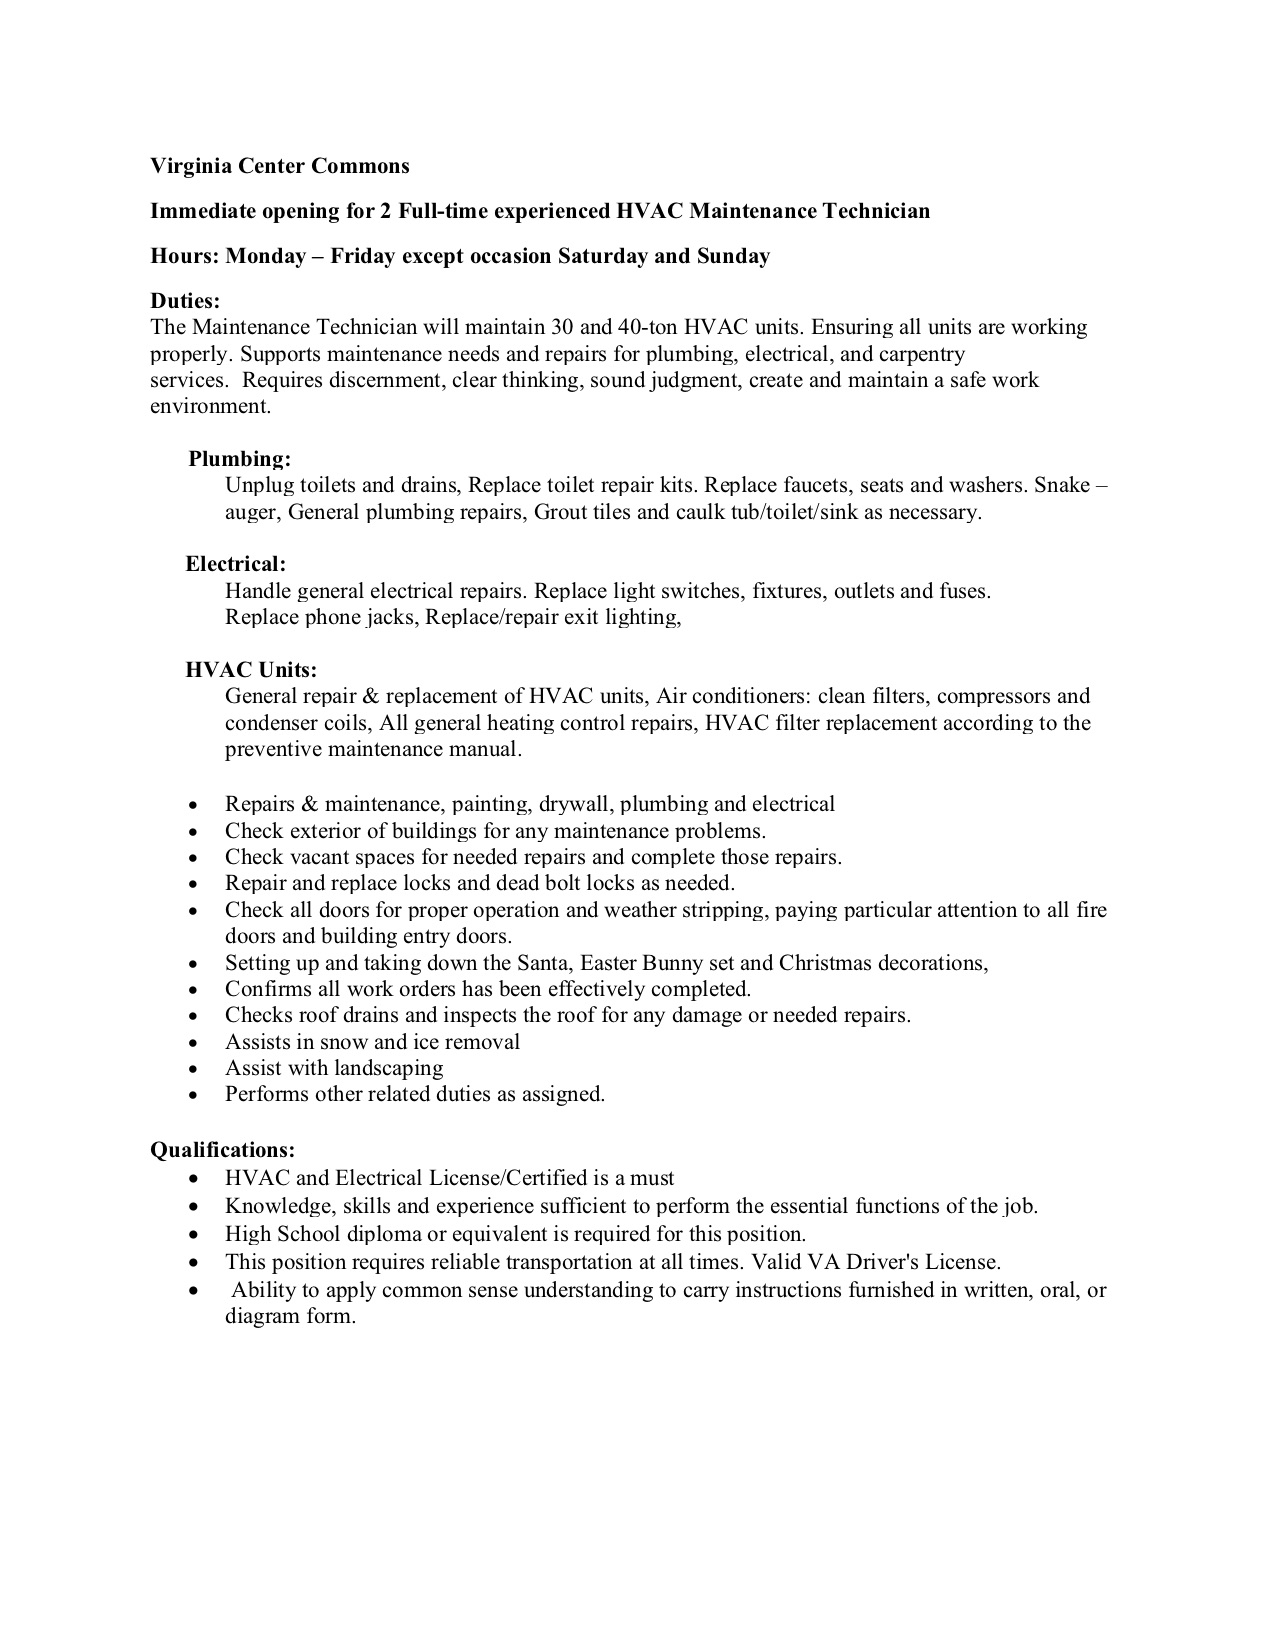 Maintenance tech job specifications